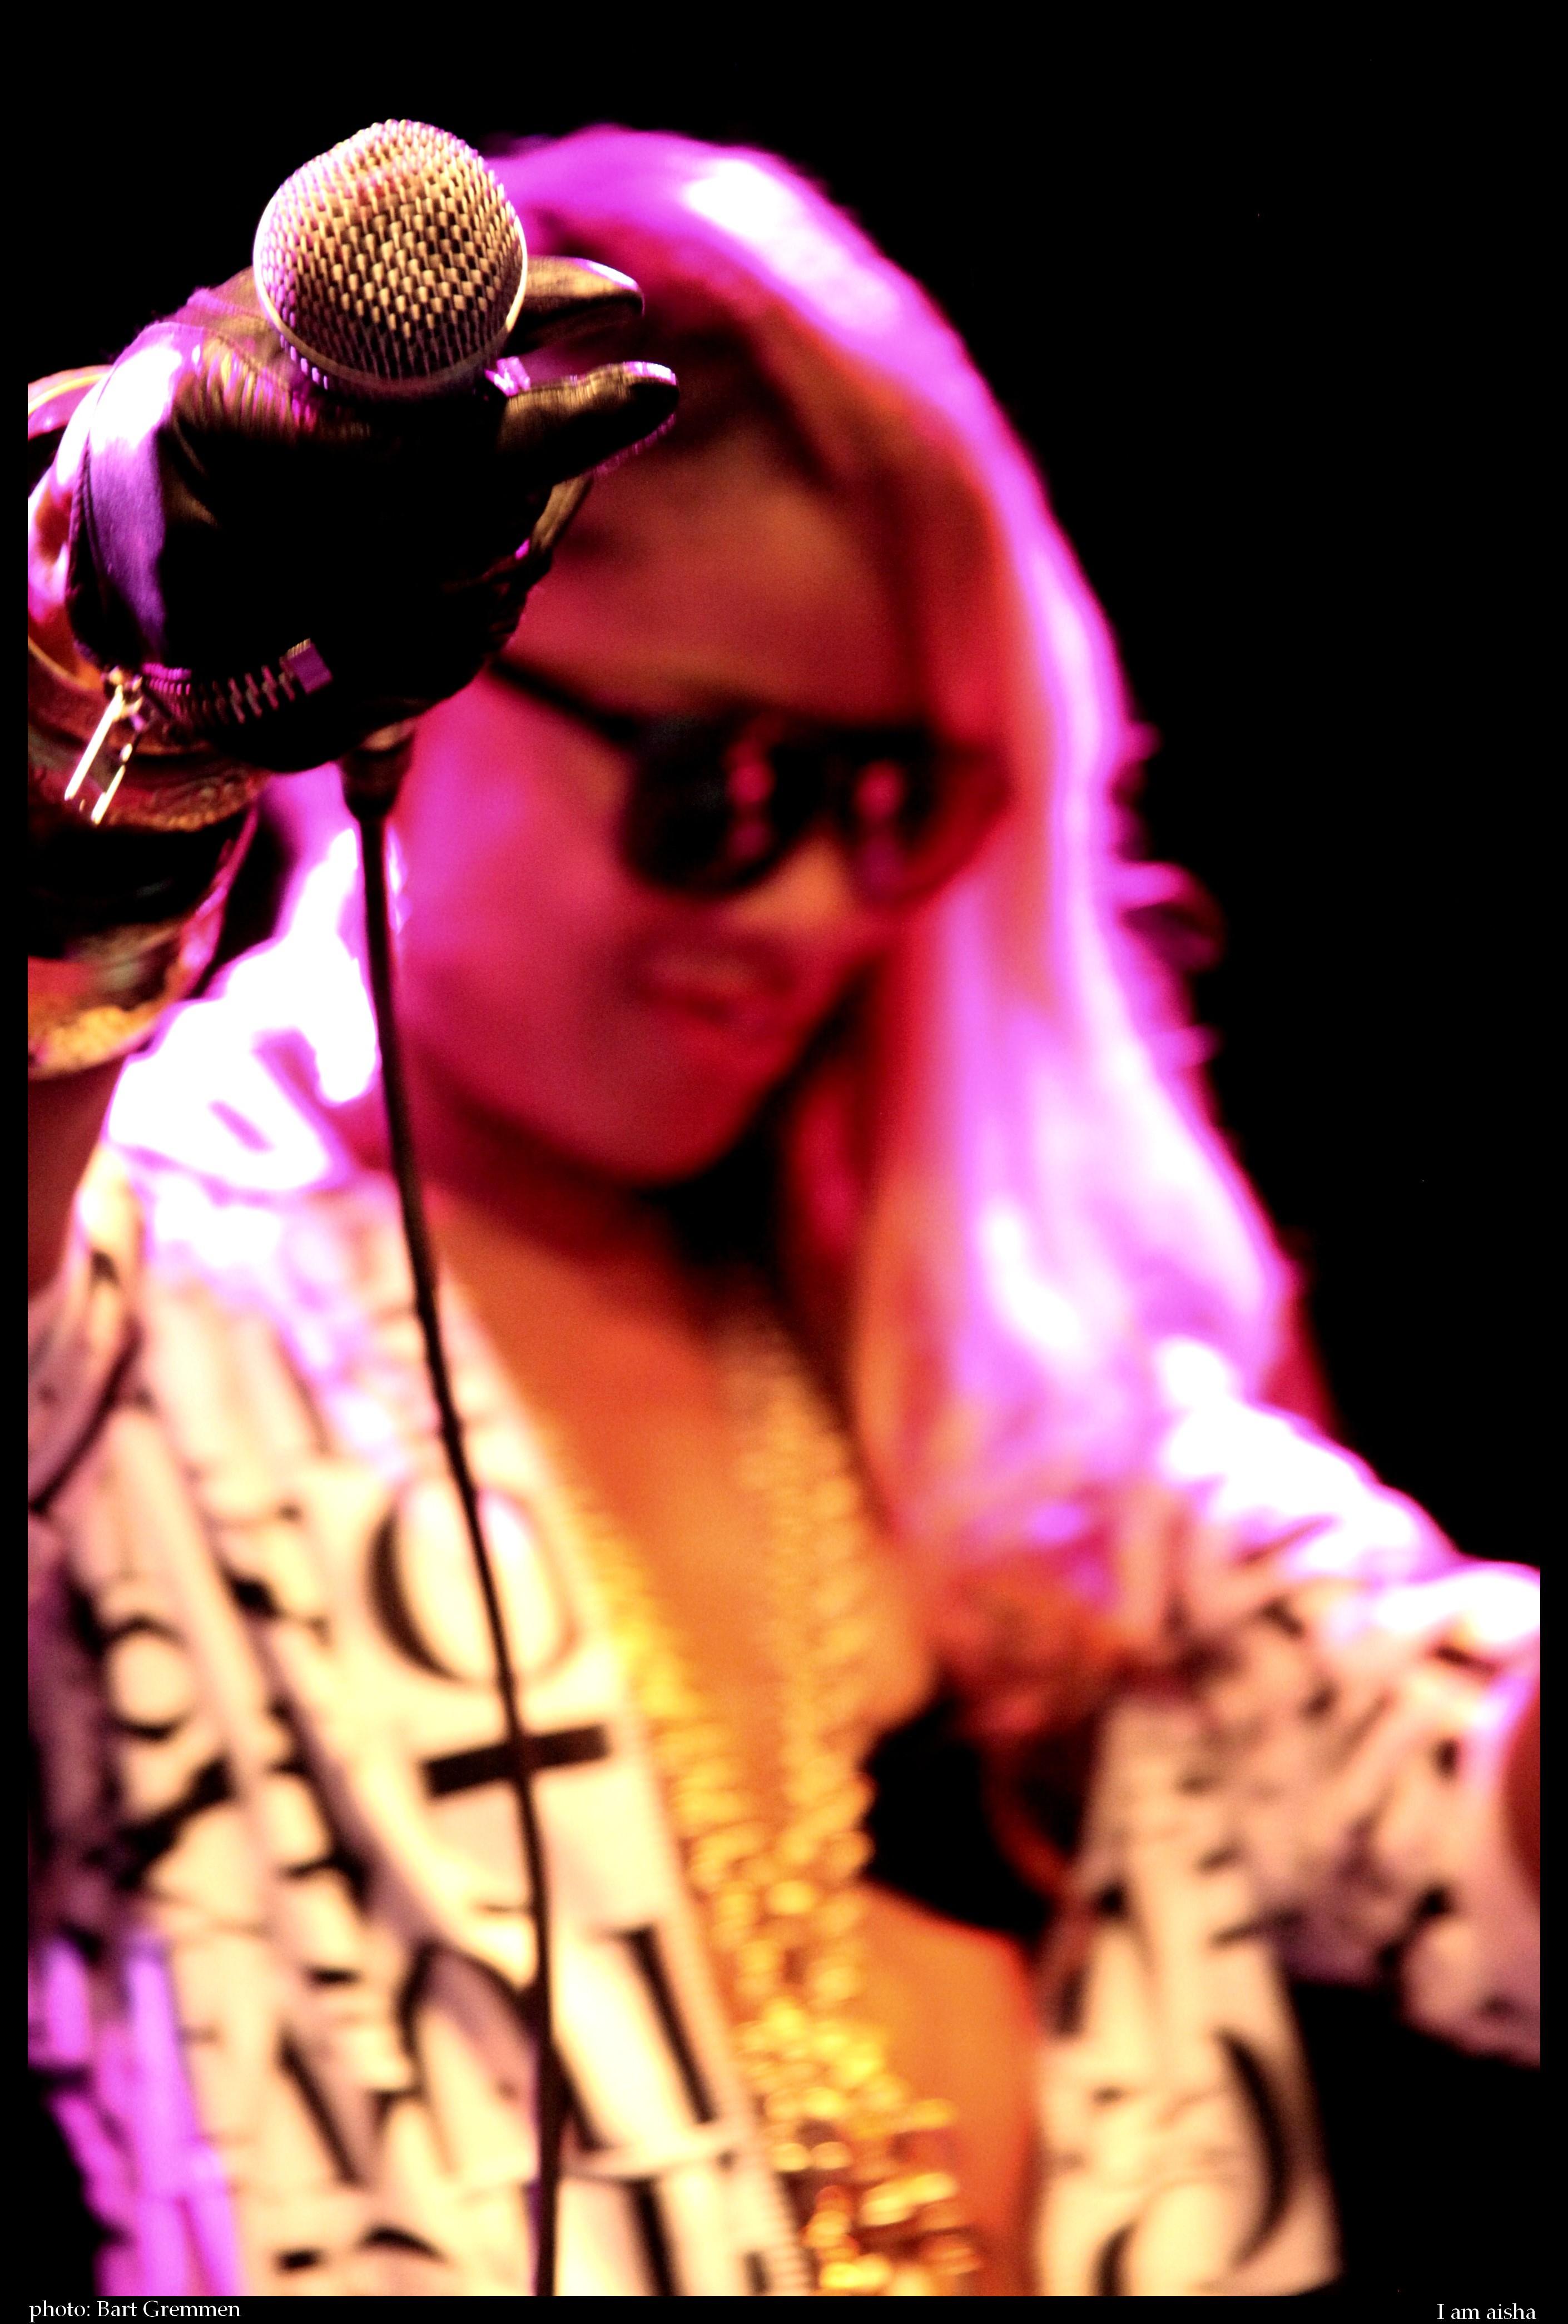 2011 - Bart Gremmen (IamAisha)